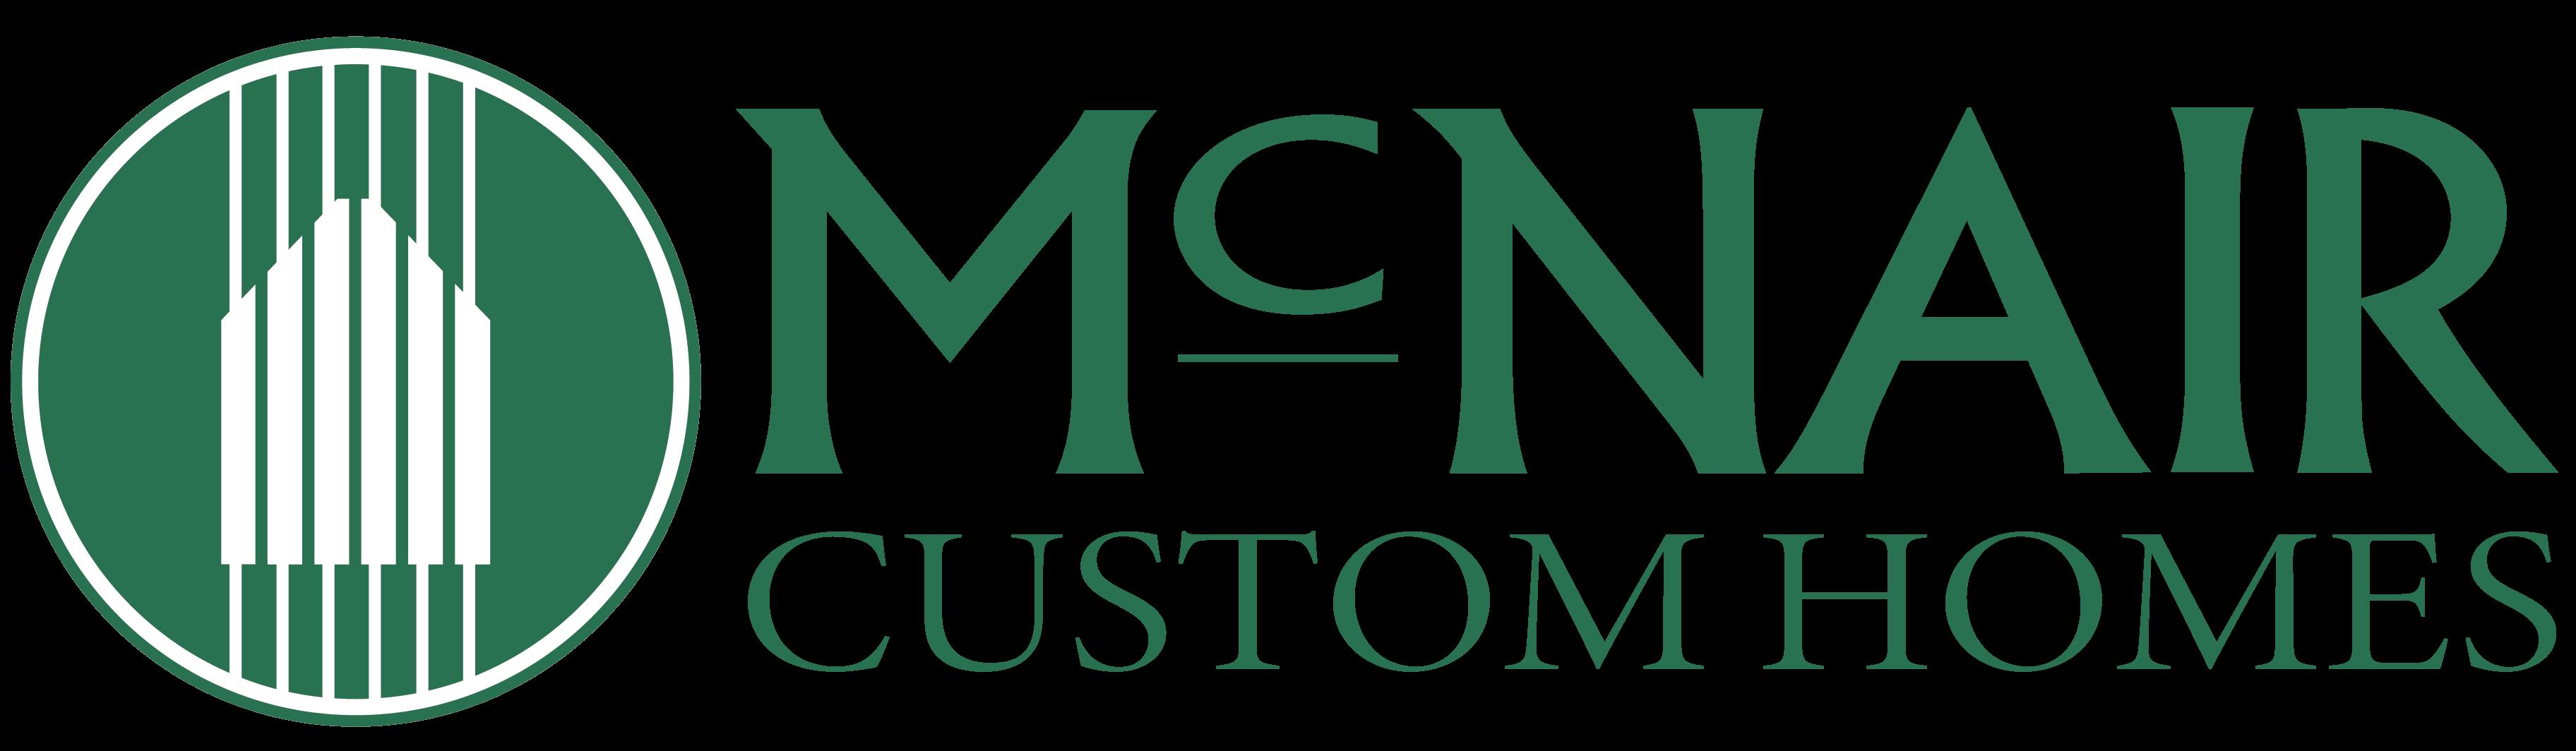 McNair Custom Homes - New Logo 2021